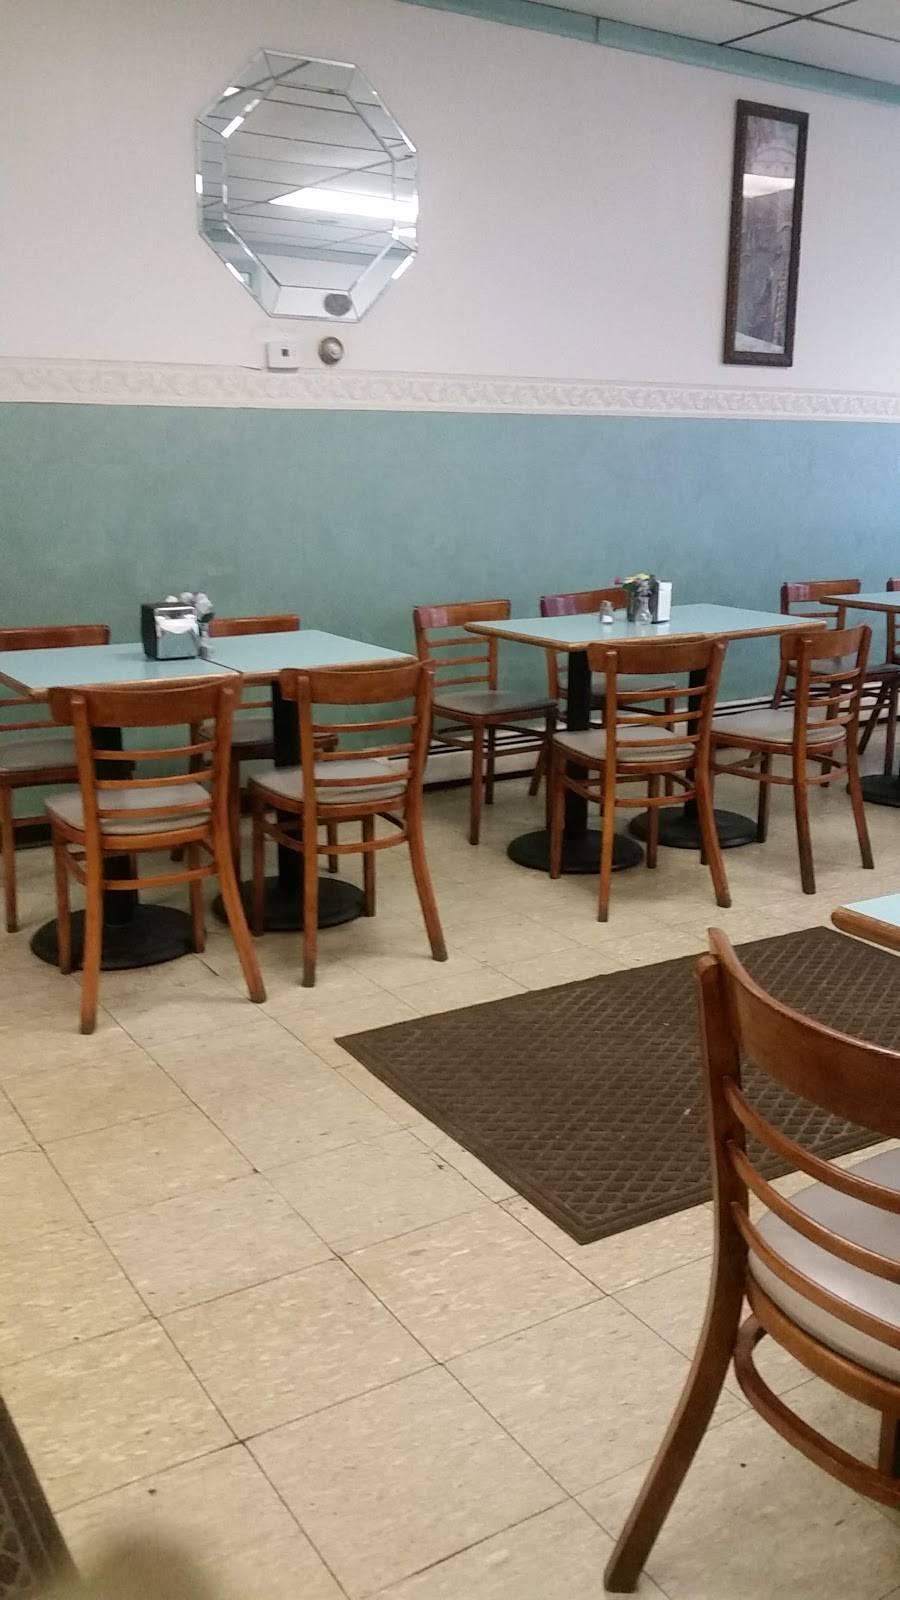 Little Anthonys 2nd Street Pizza Shop | restaurant | 133 S 2nd St, Frackville, PA 17931, USA | 5708741650 OR +1 570-874-1650